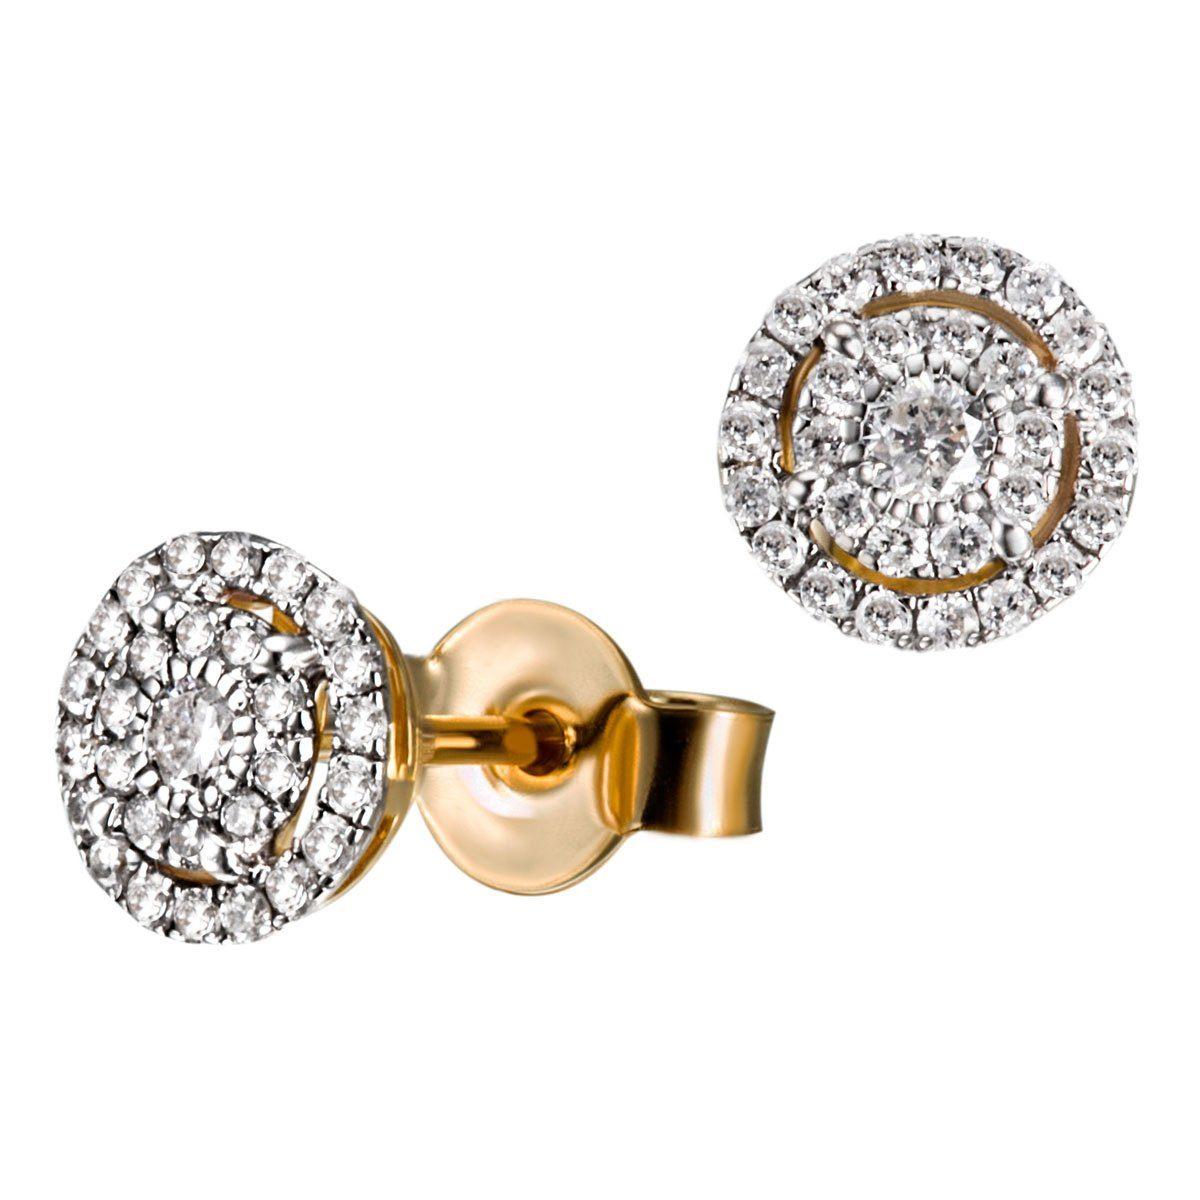 goldmaid Paar Ohrstecker 585/- Gelbgold 58 Brillanten 0,32 ct. P2/H